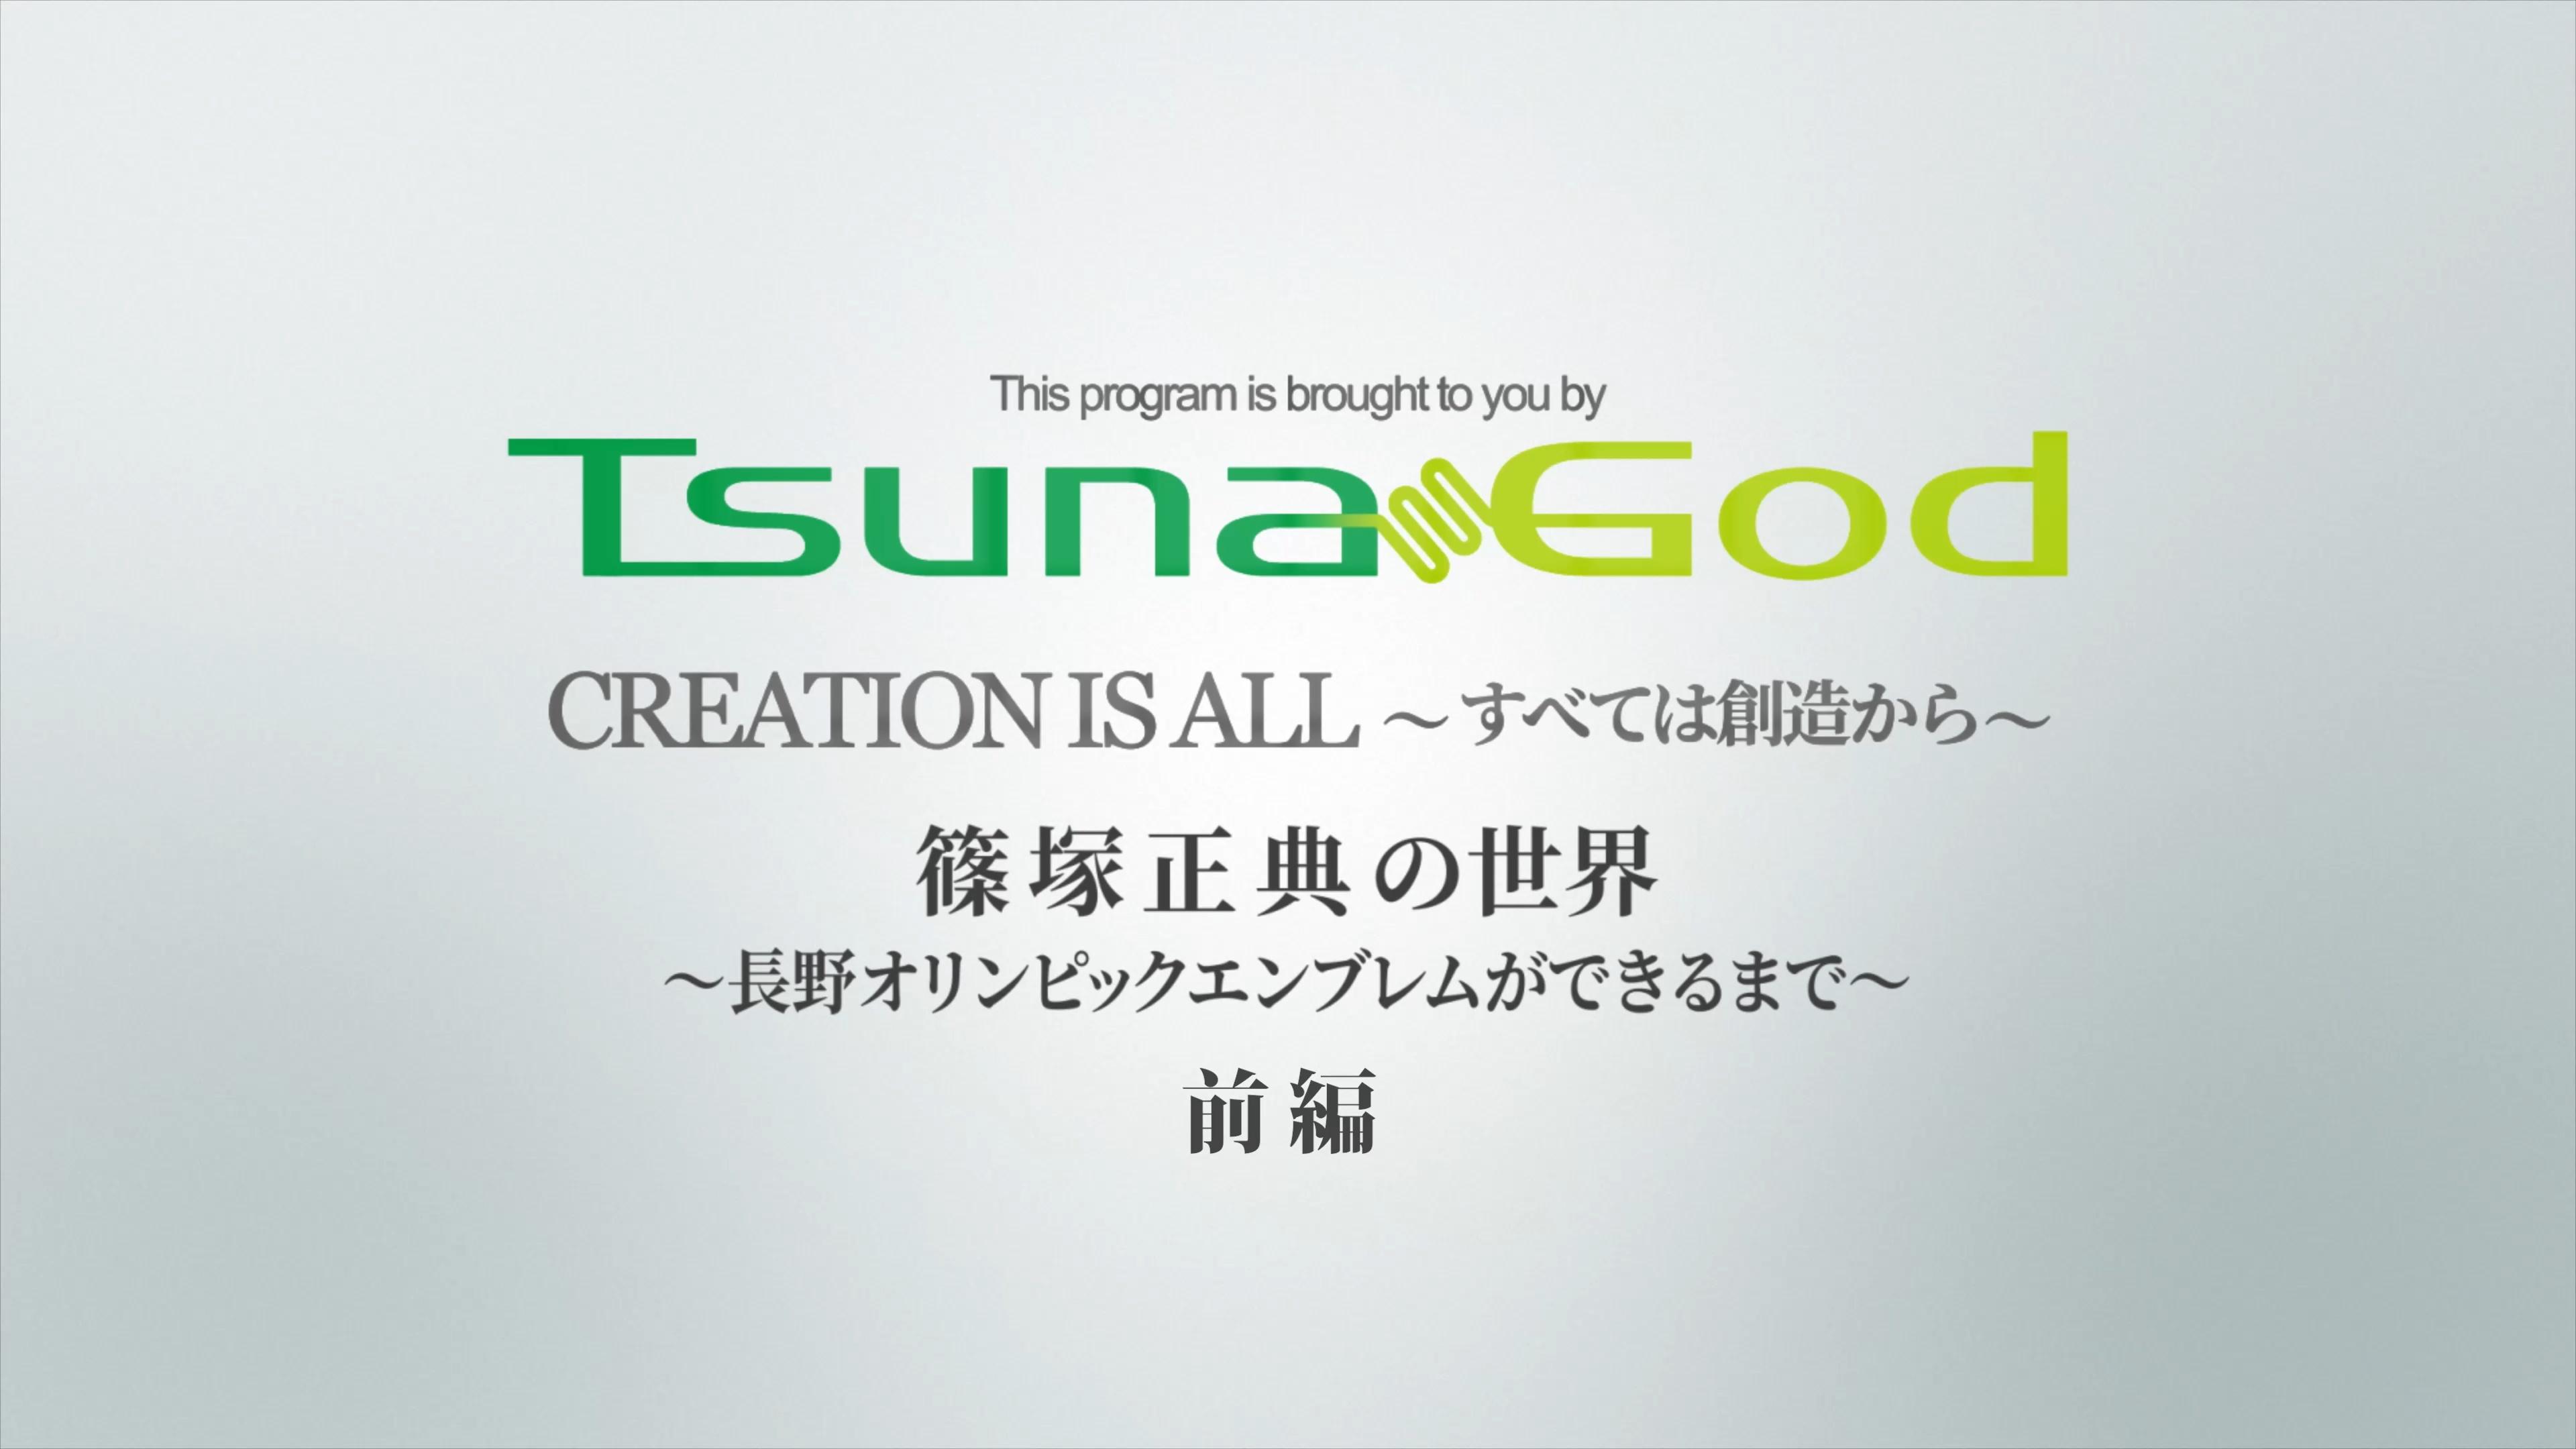 CREATION IS ALL~すべては創造から~  篠塚正典の世界 長野オリンピックエンブレムができるまで (前編)